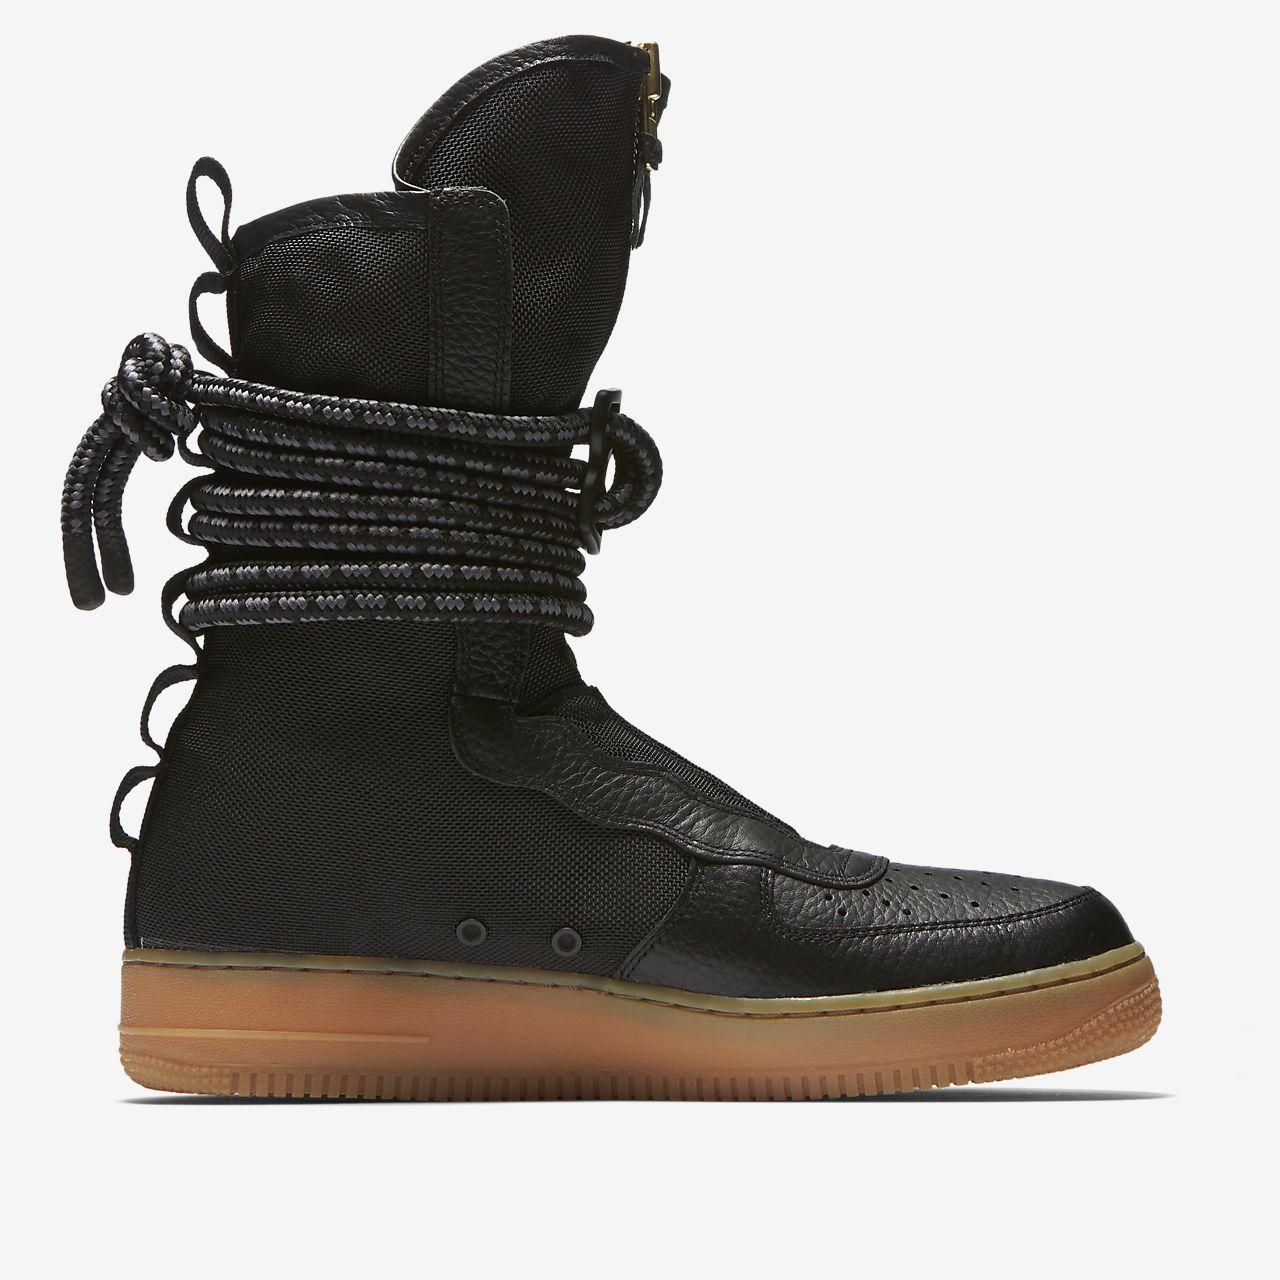 ... Botte Nike SF Air Force 1 Hi pour Homme